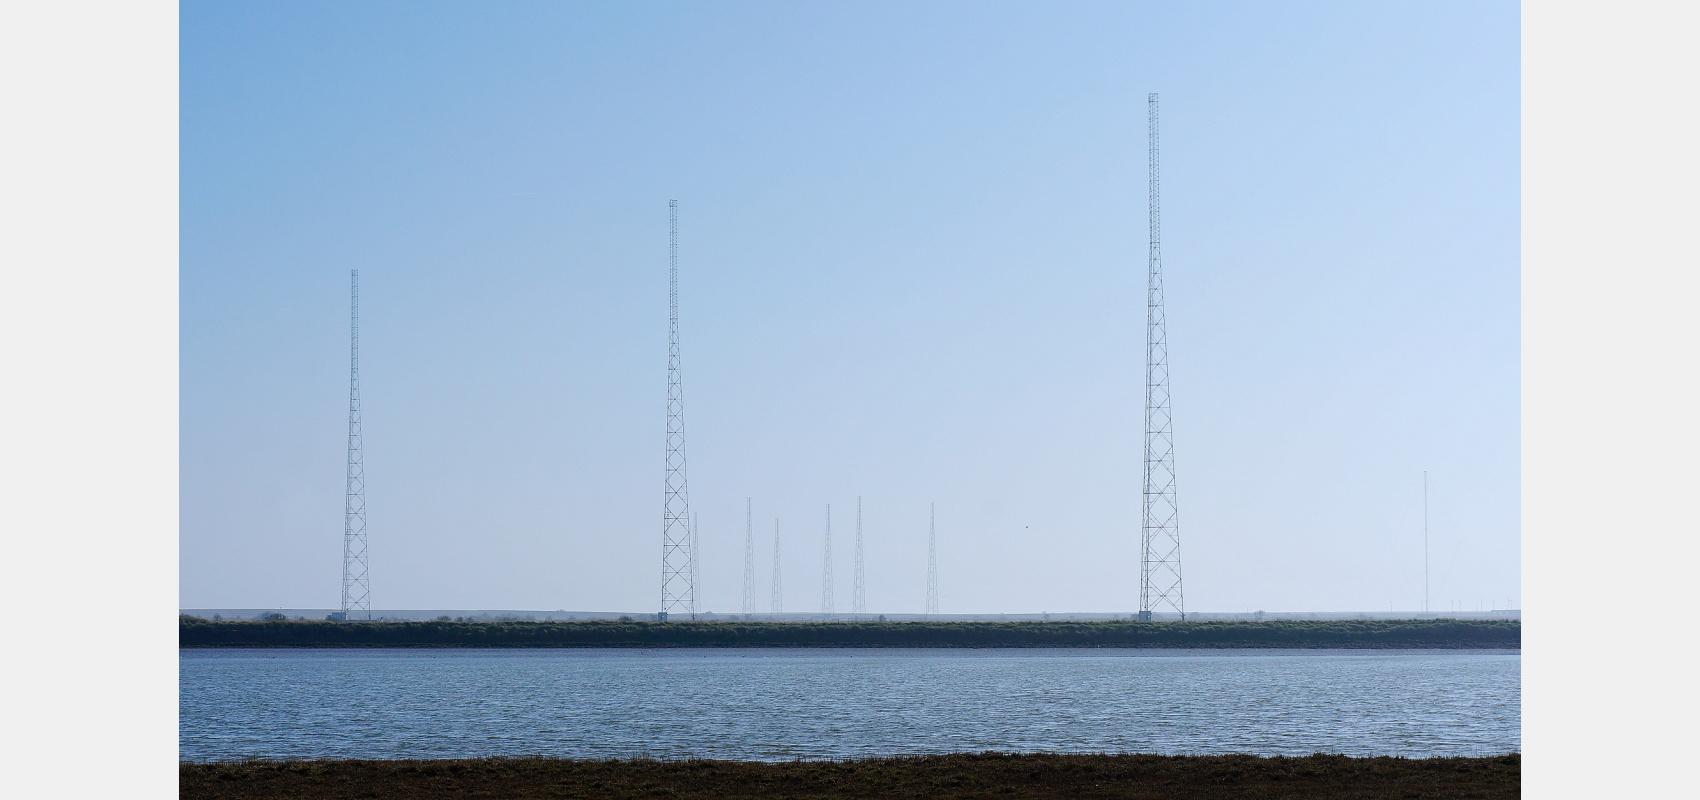 Location, landscape, Coastal series, Radio, masts, Orford Ness